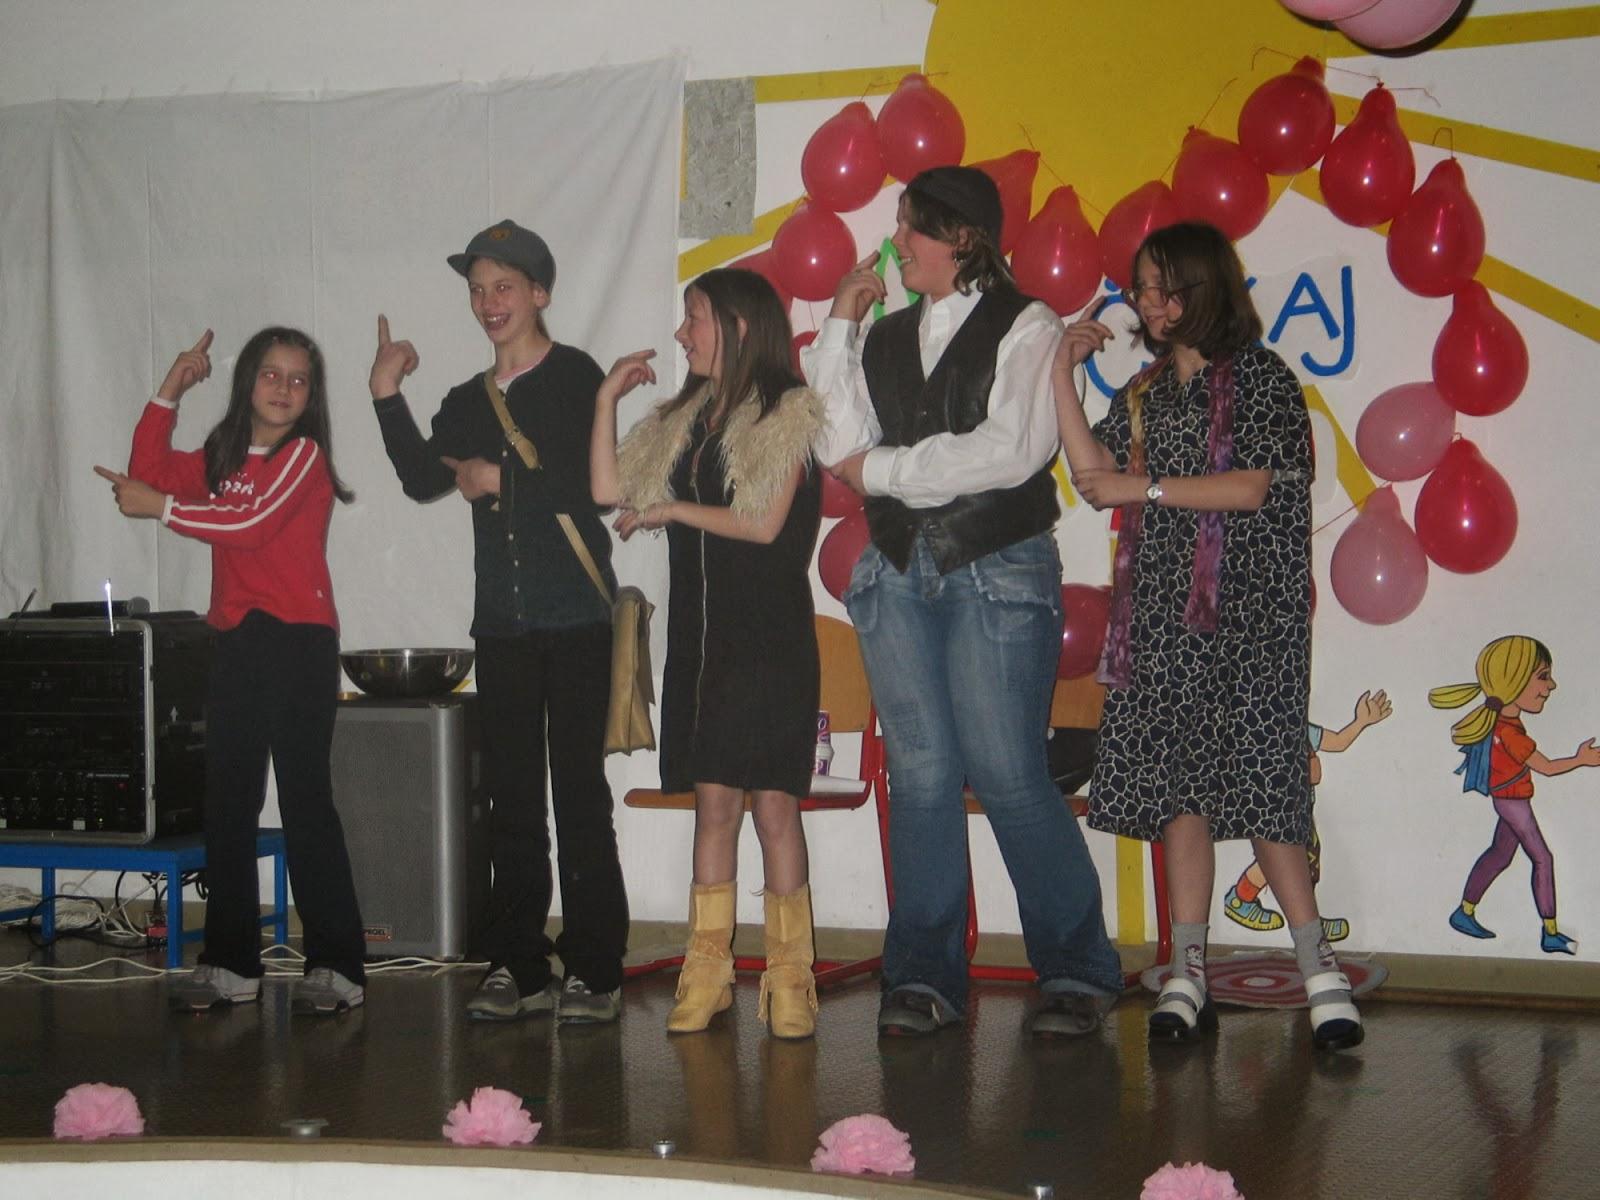 Tabosong, Ilirska Bistrica 2005 - Picture%2B107.jpg